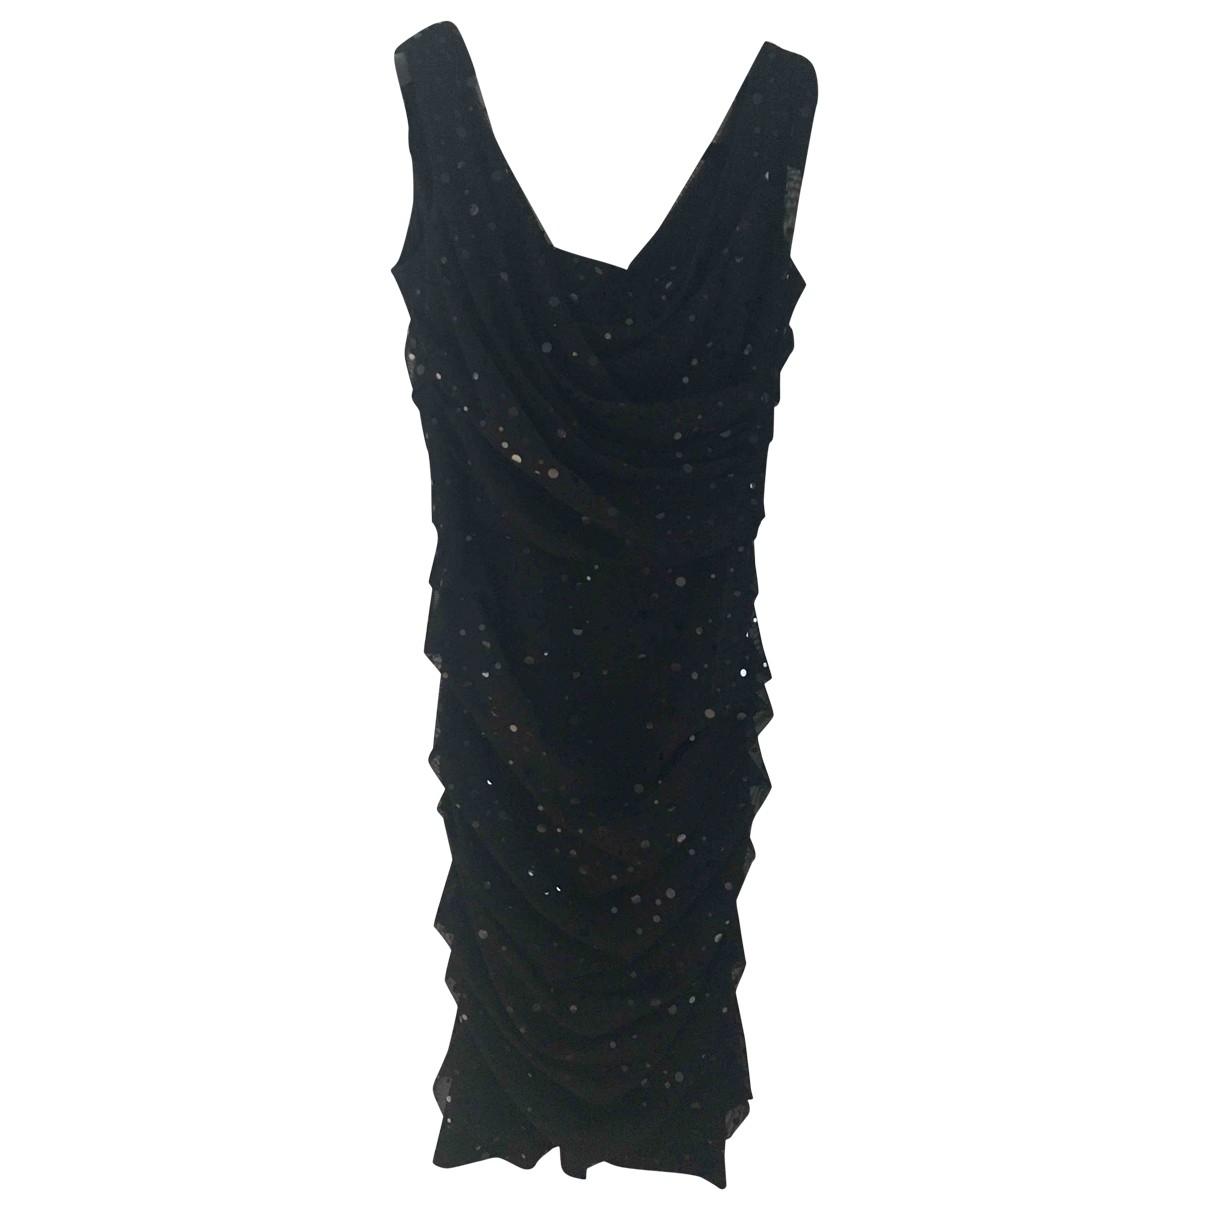 Dolce & Gabbana \N Black Glitter dress for Women 40 IT